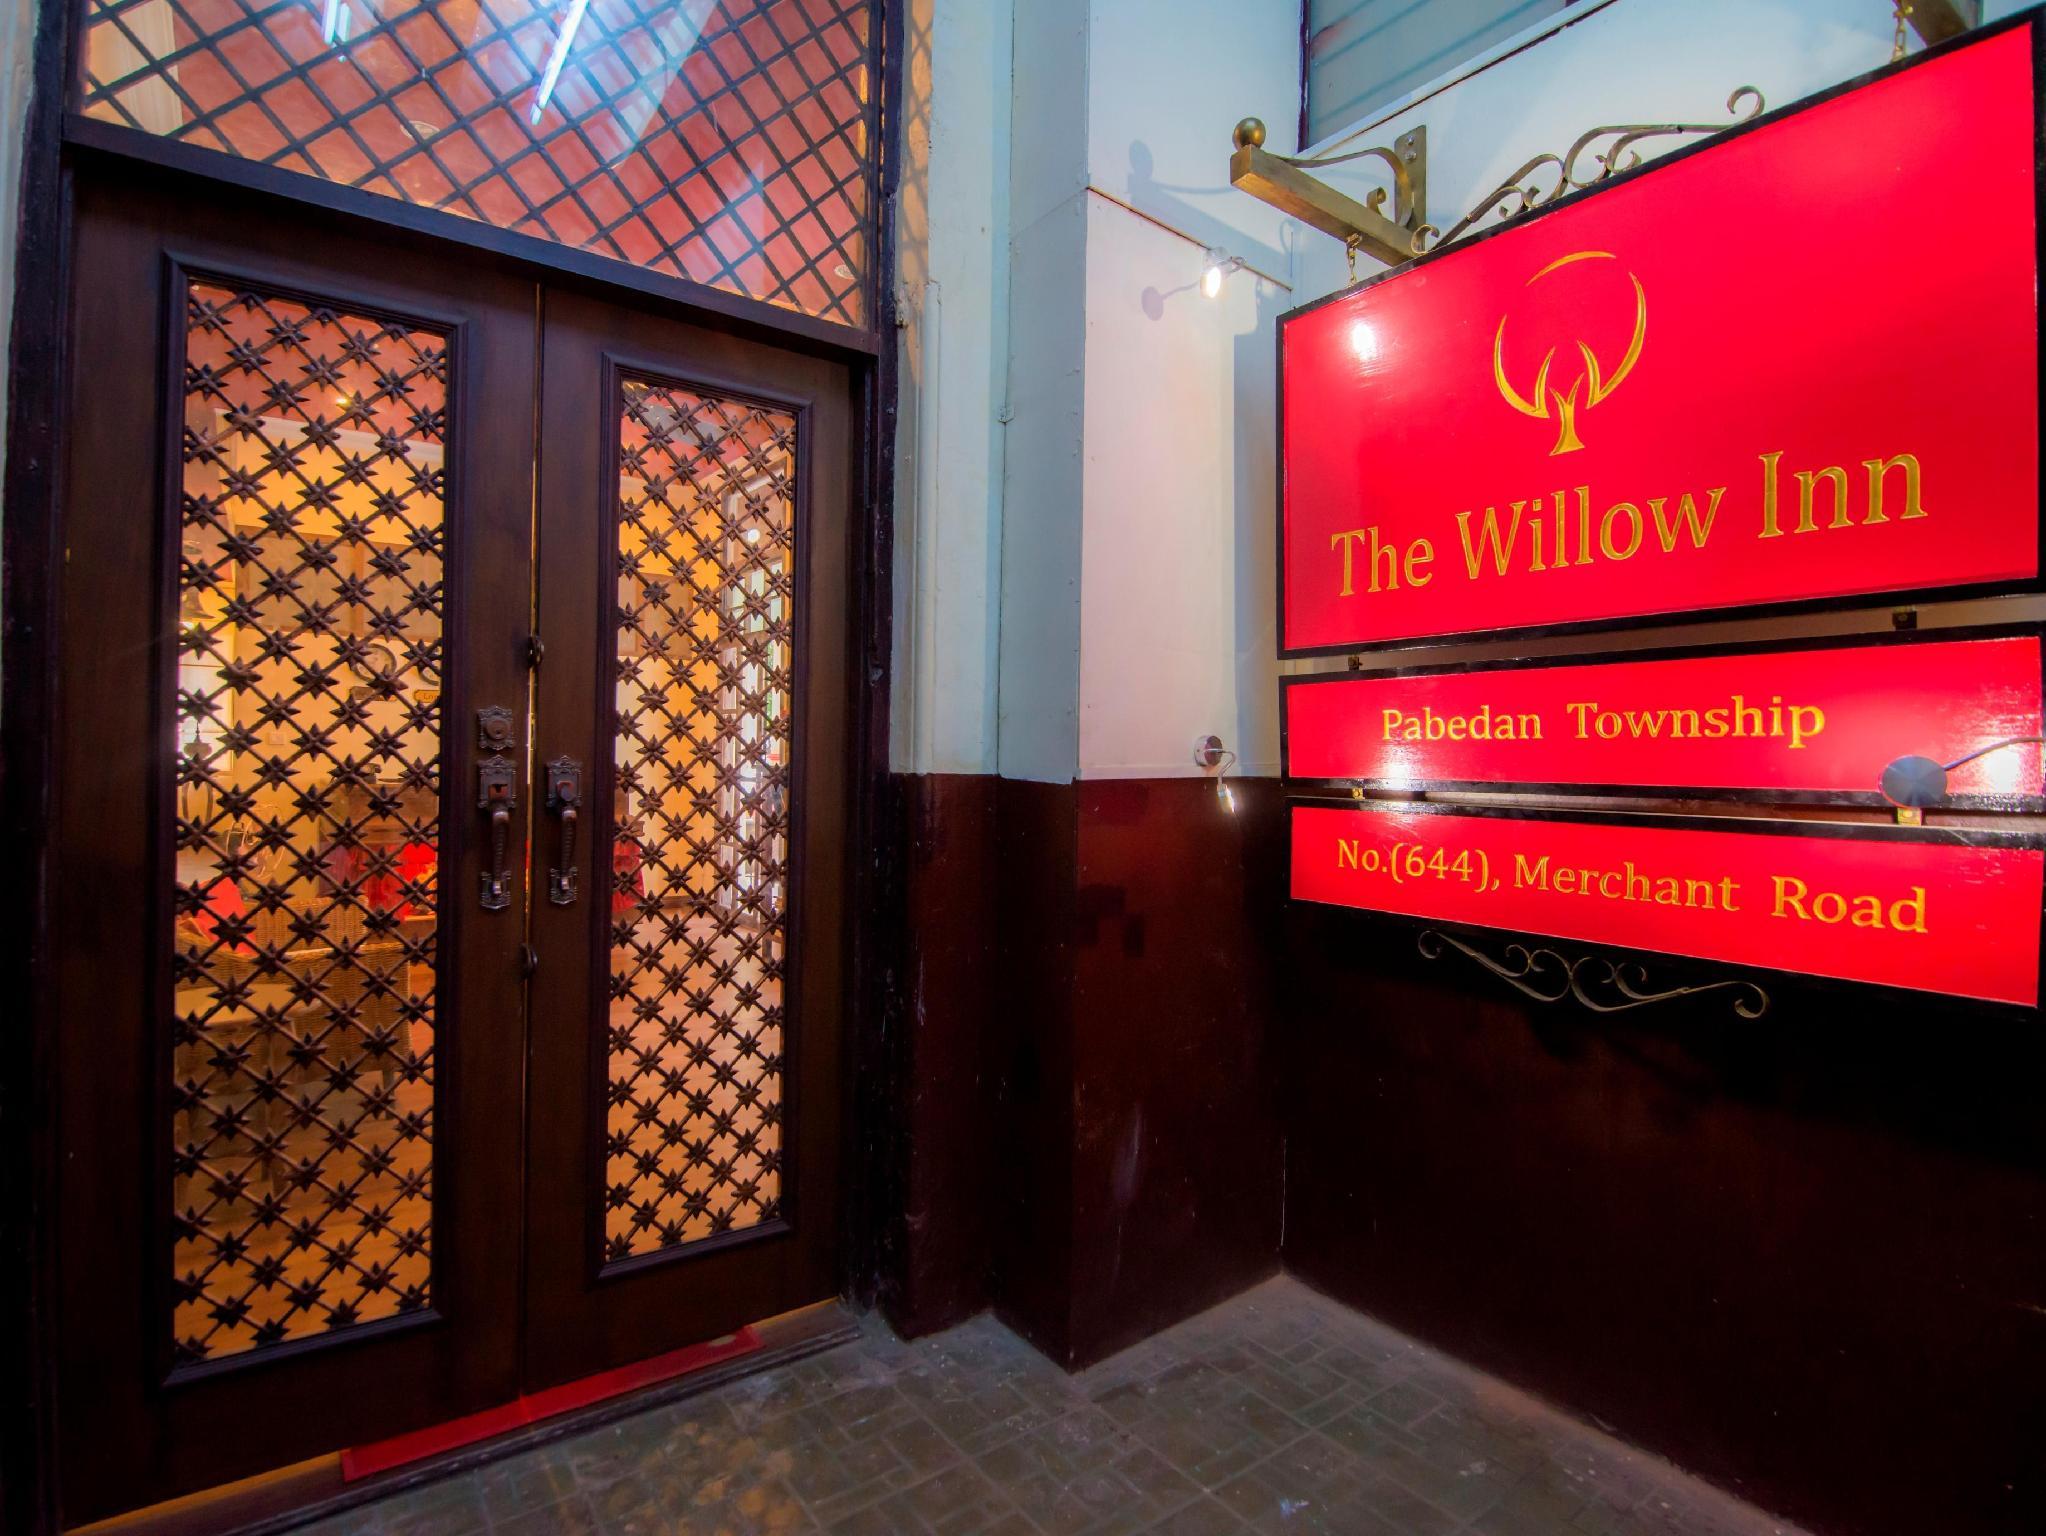 The Willow Inn